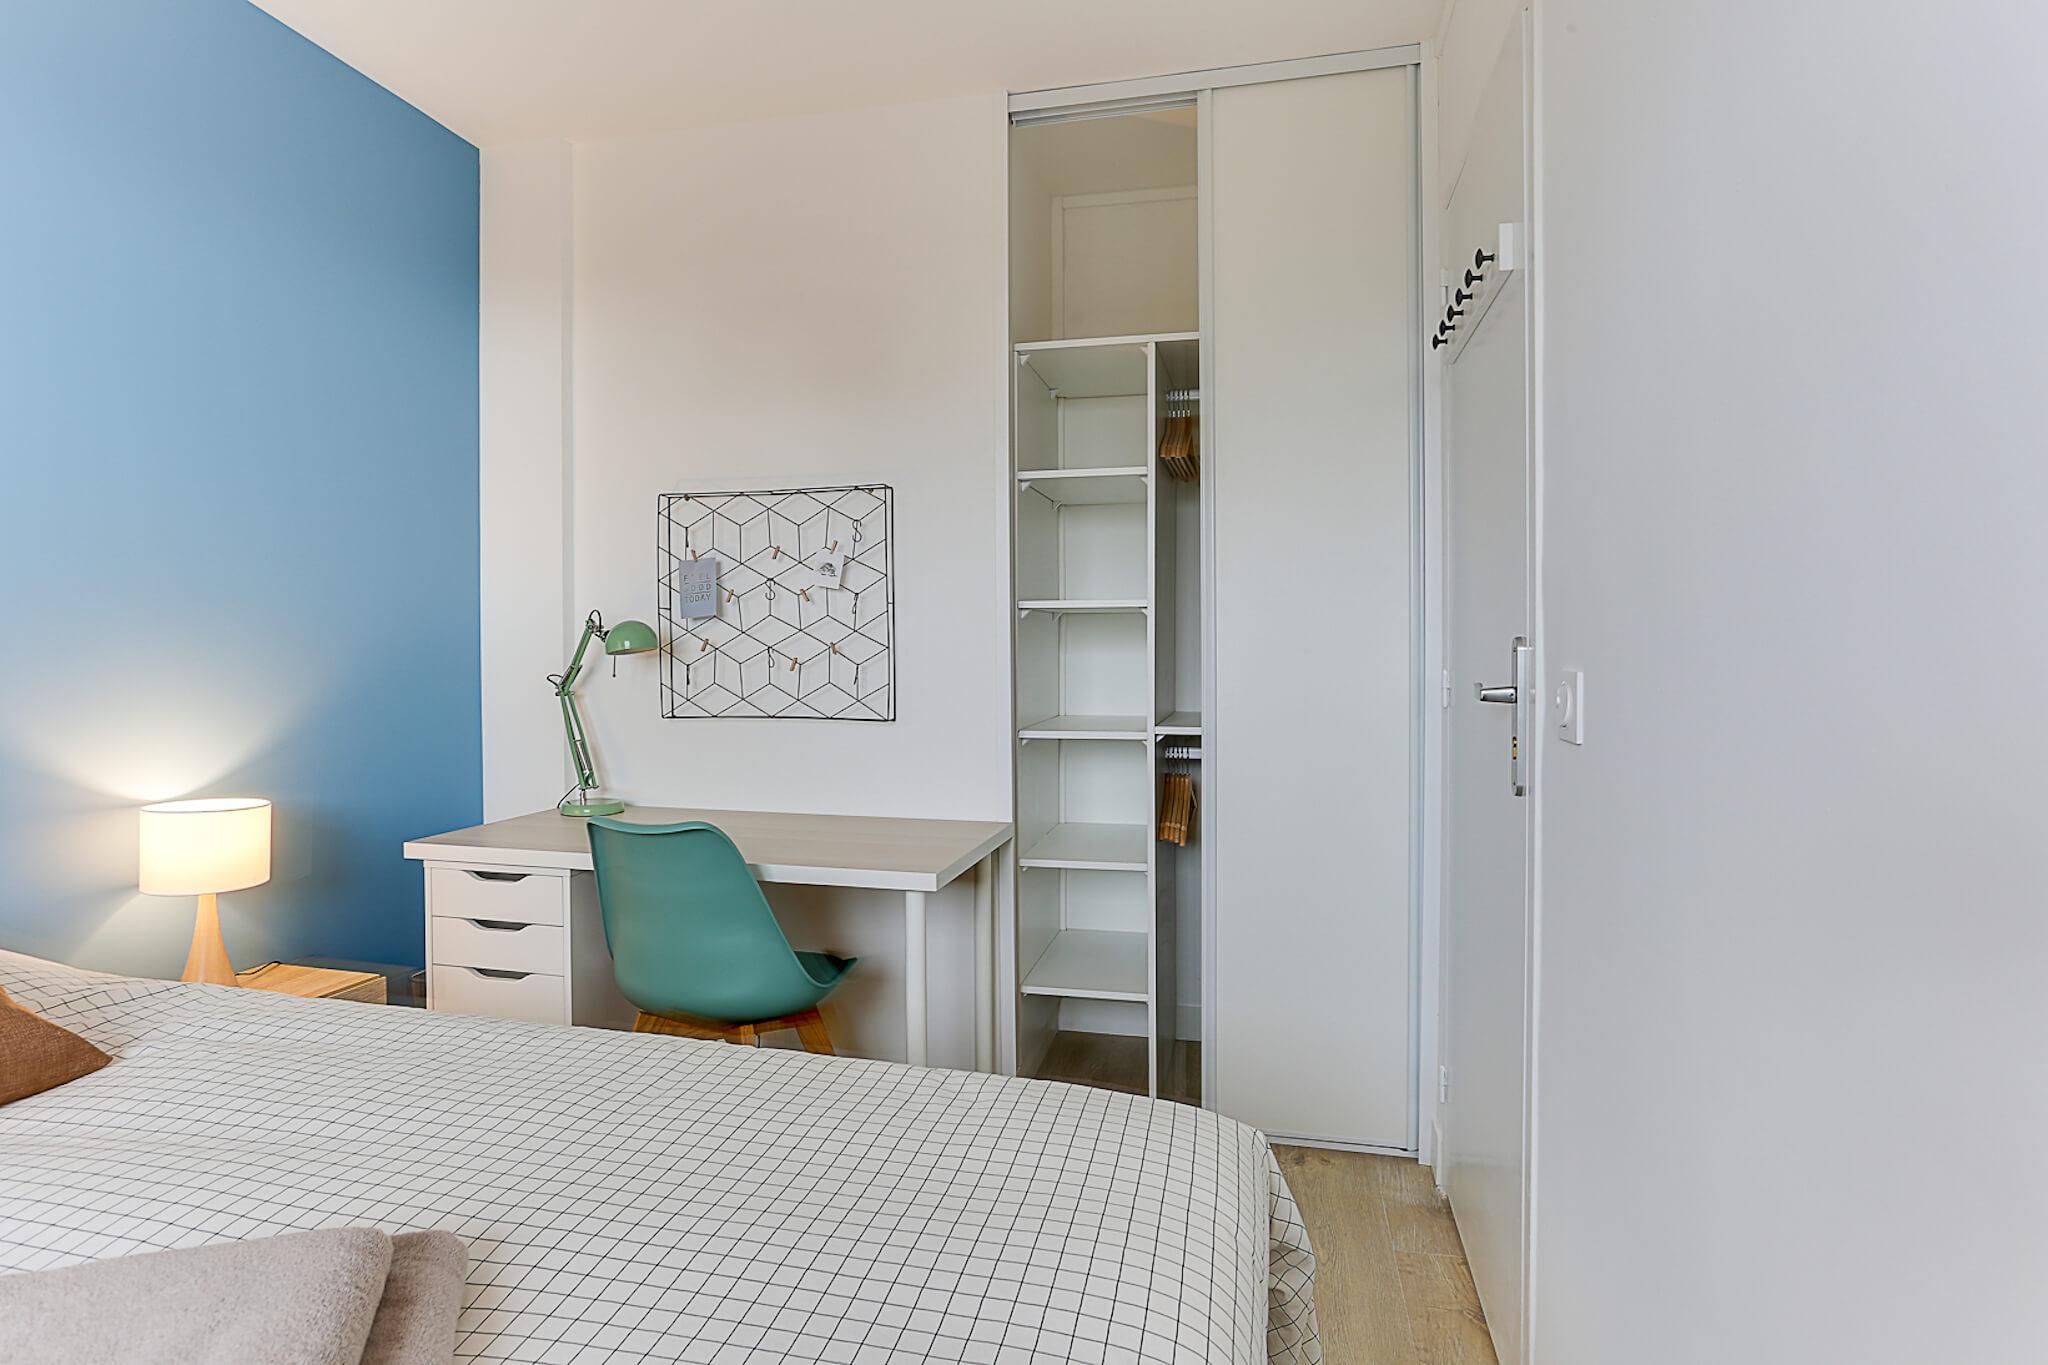 grande-chambre-lumineuse-location-colocation-appartement-meublé-rennes